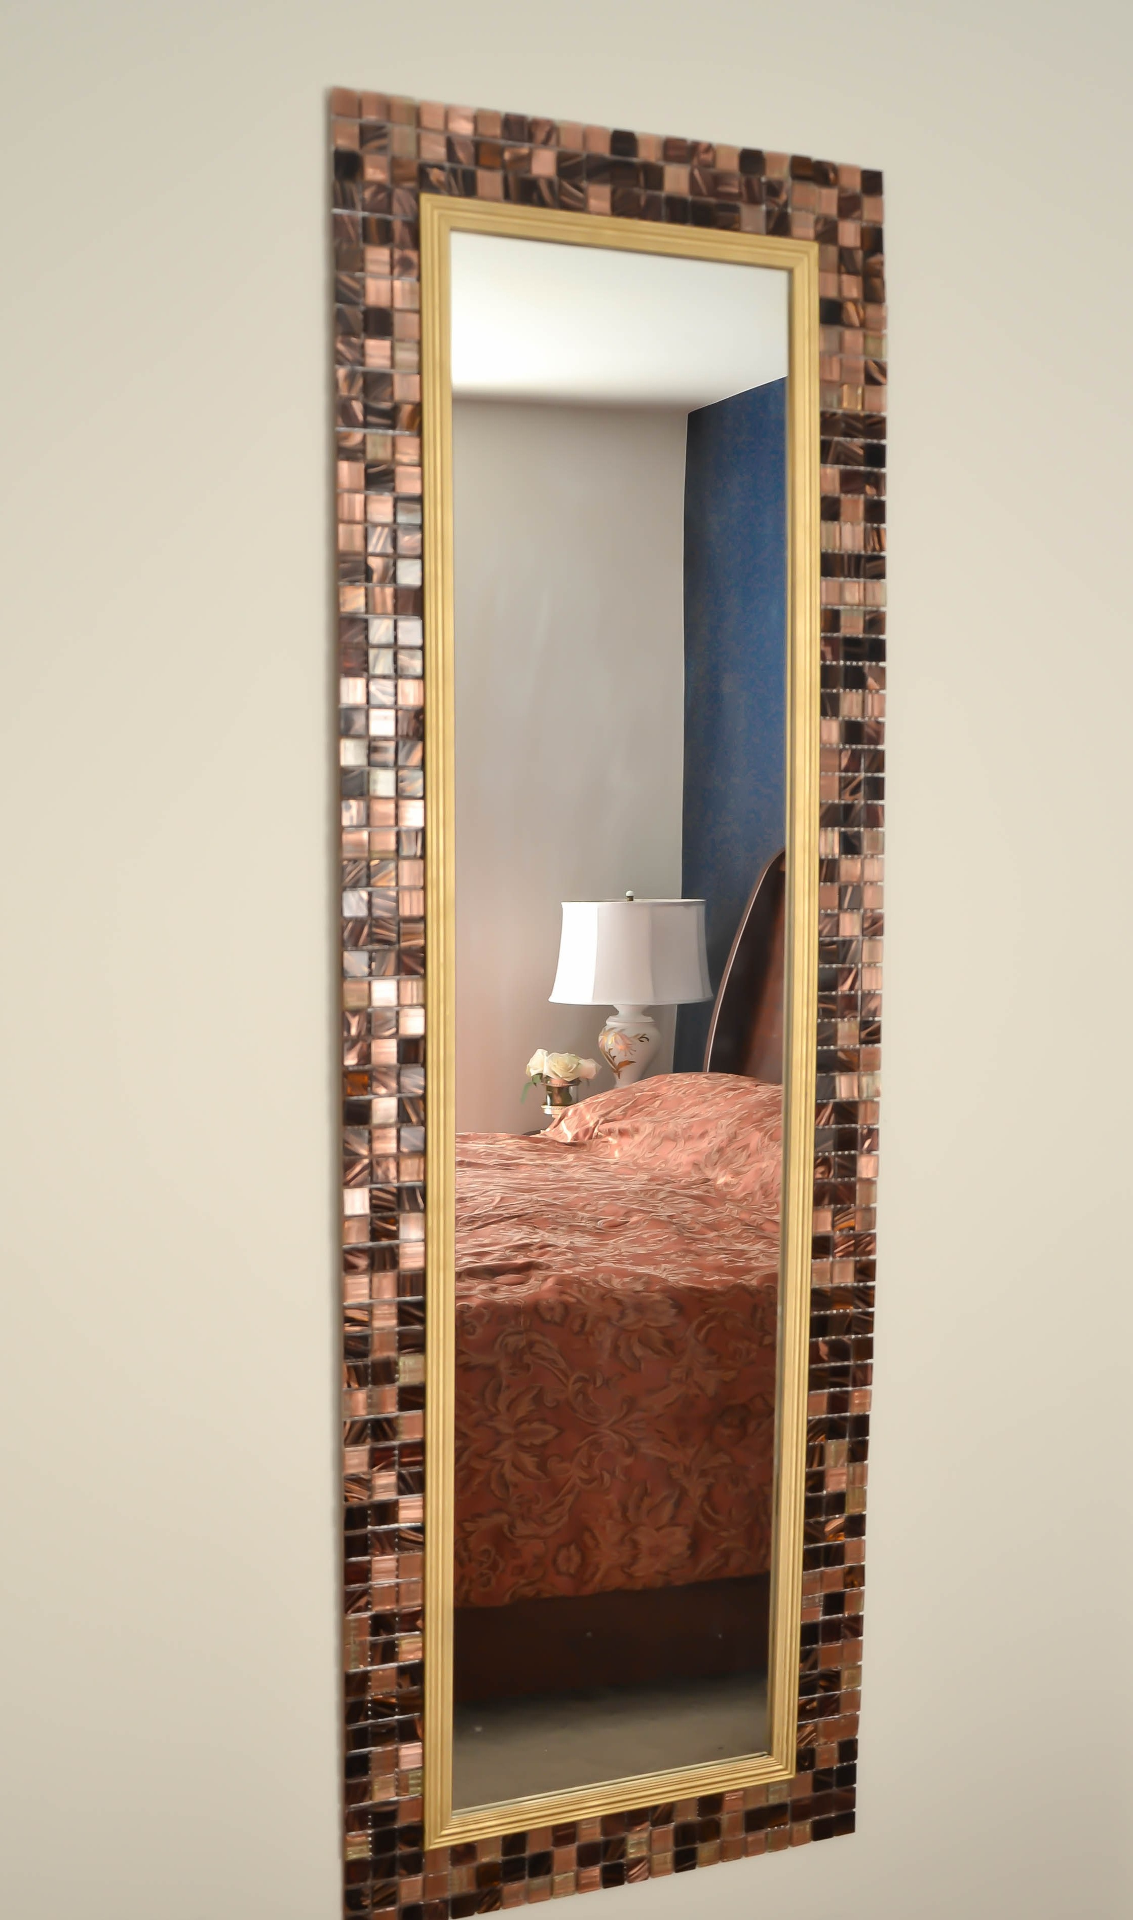 Diy cadre de miroir en carrelage mosa que for Mosaique miroir